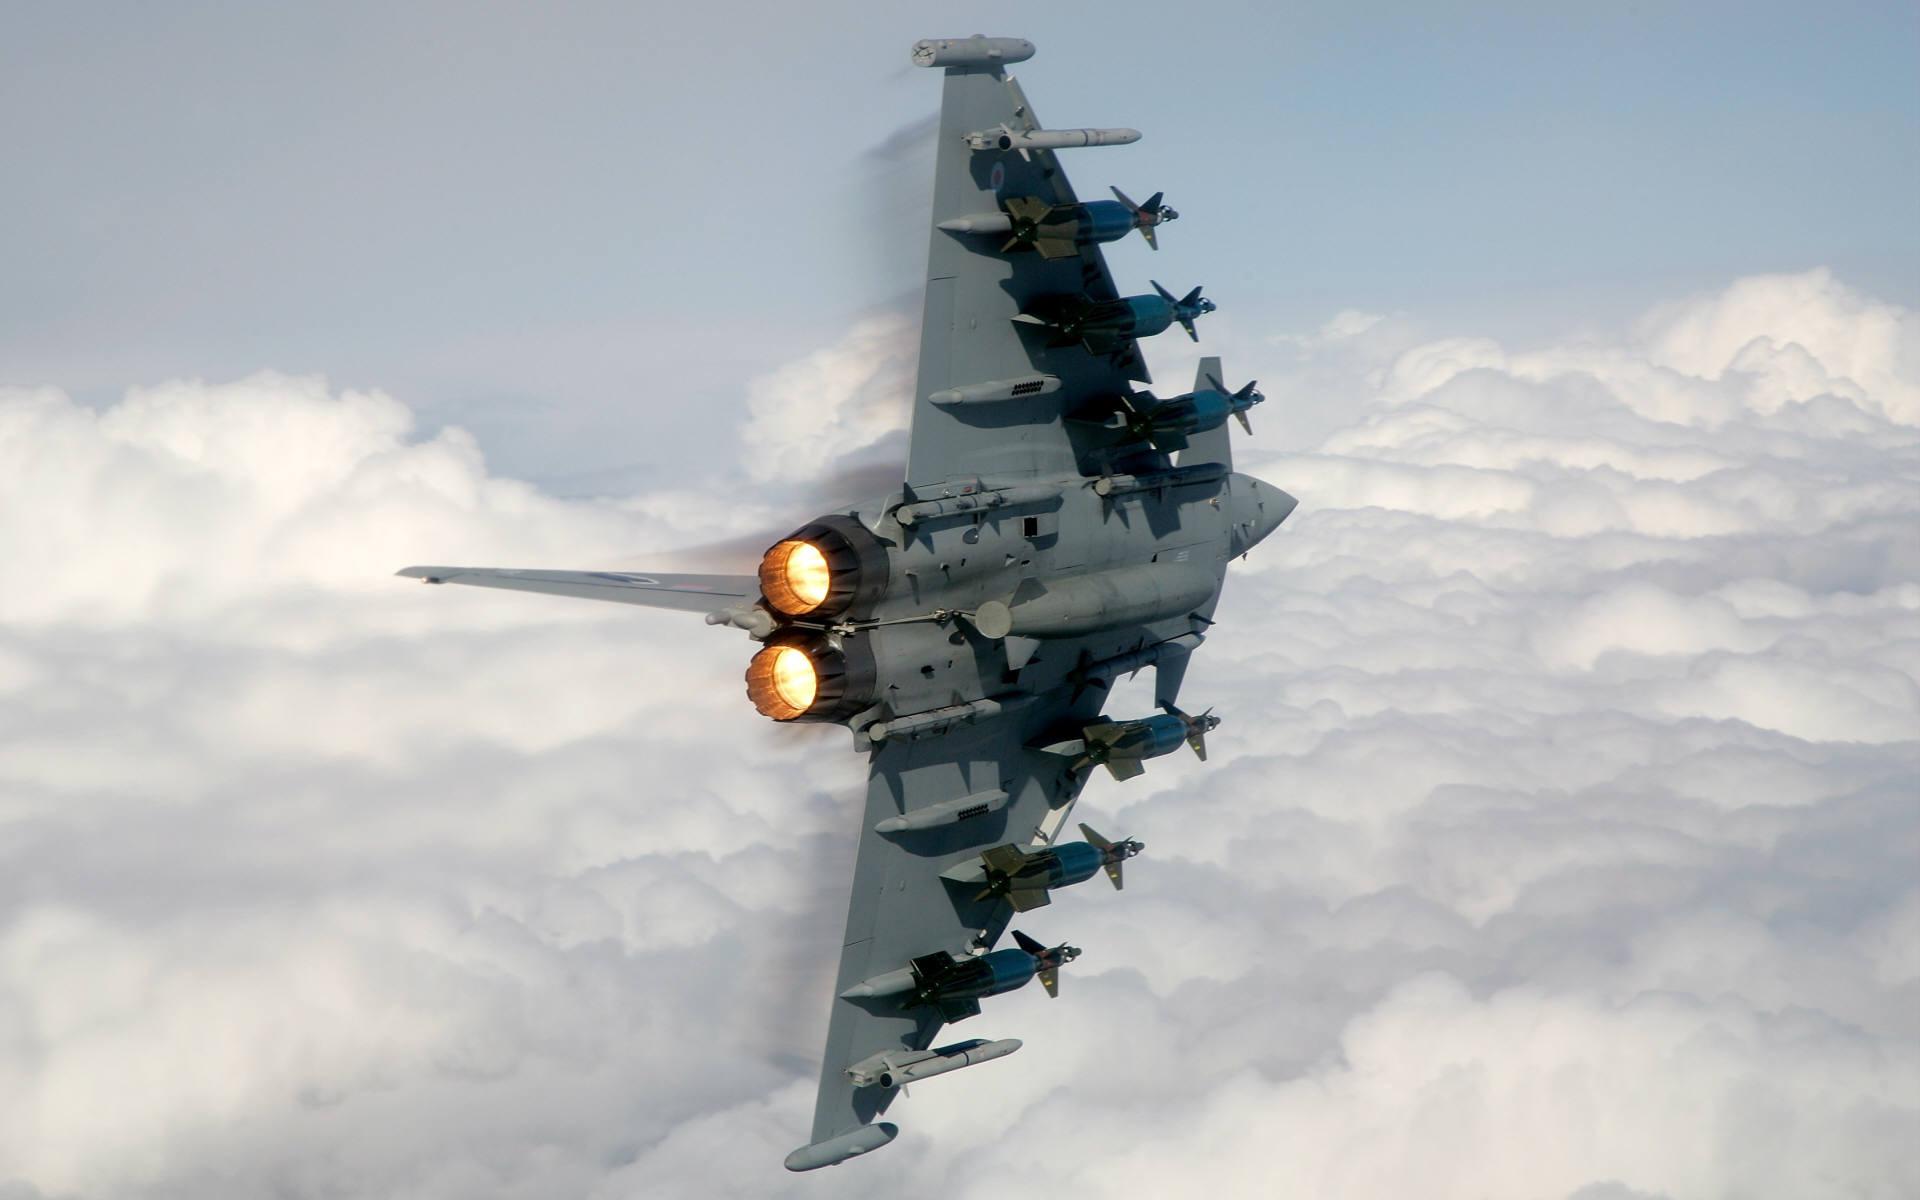 73+] Fighter Jet Desktop Backgrounds on WallpaperSafari